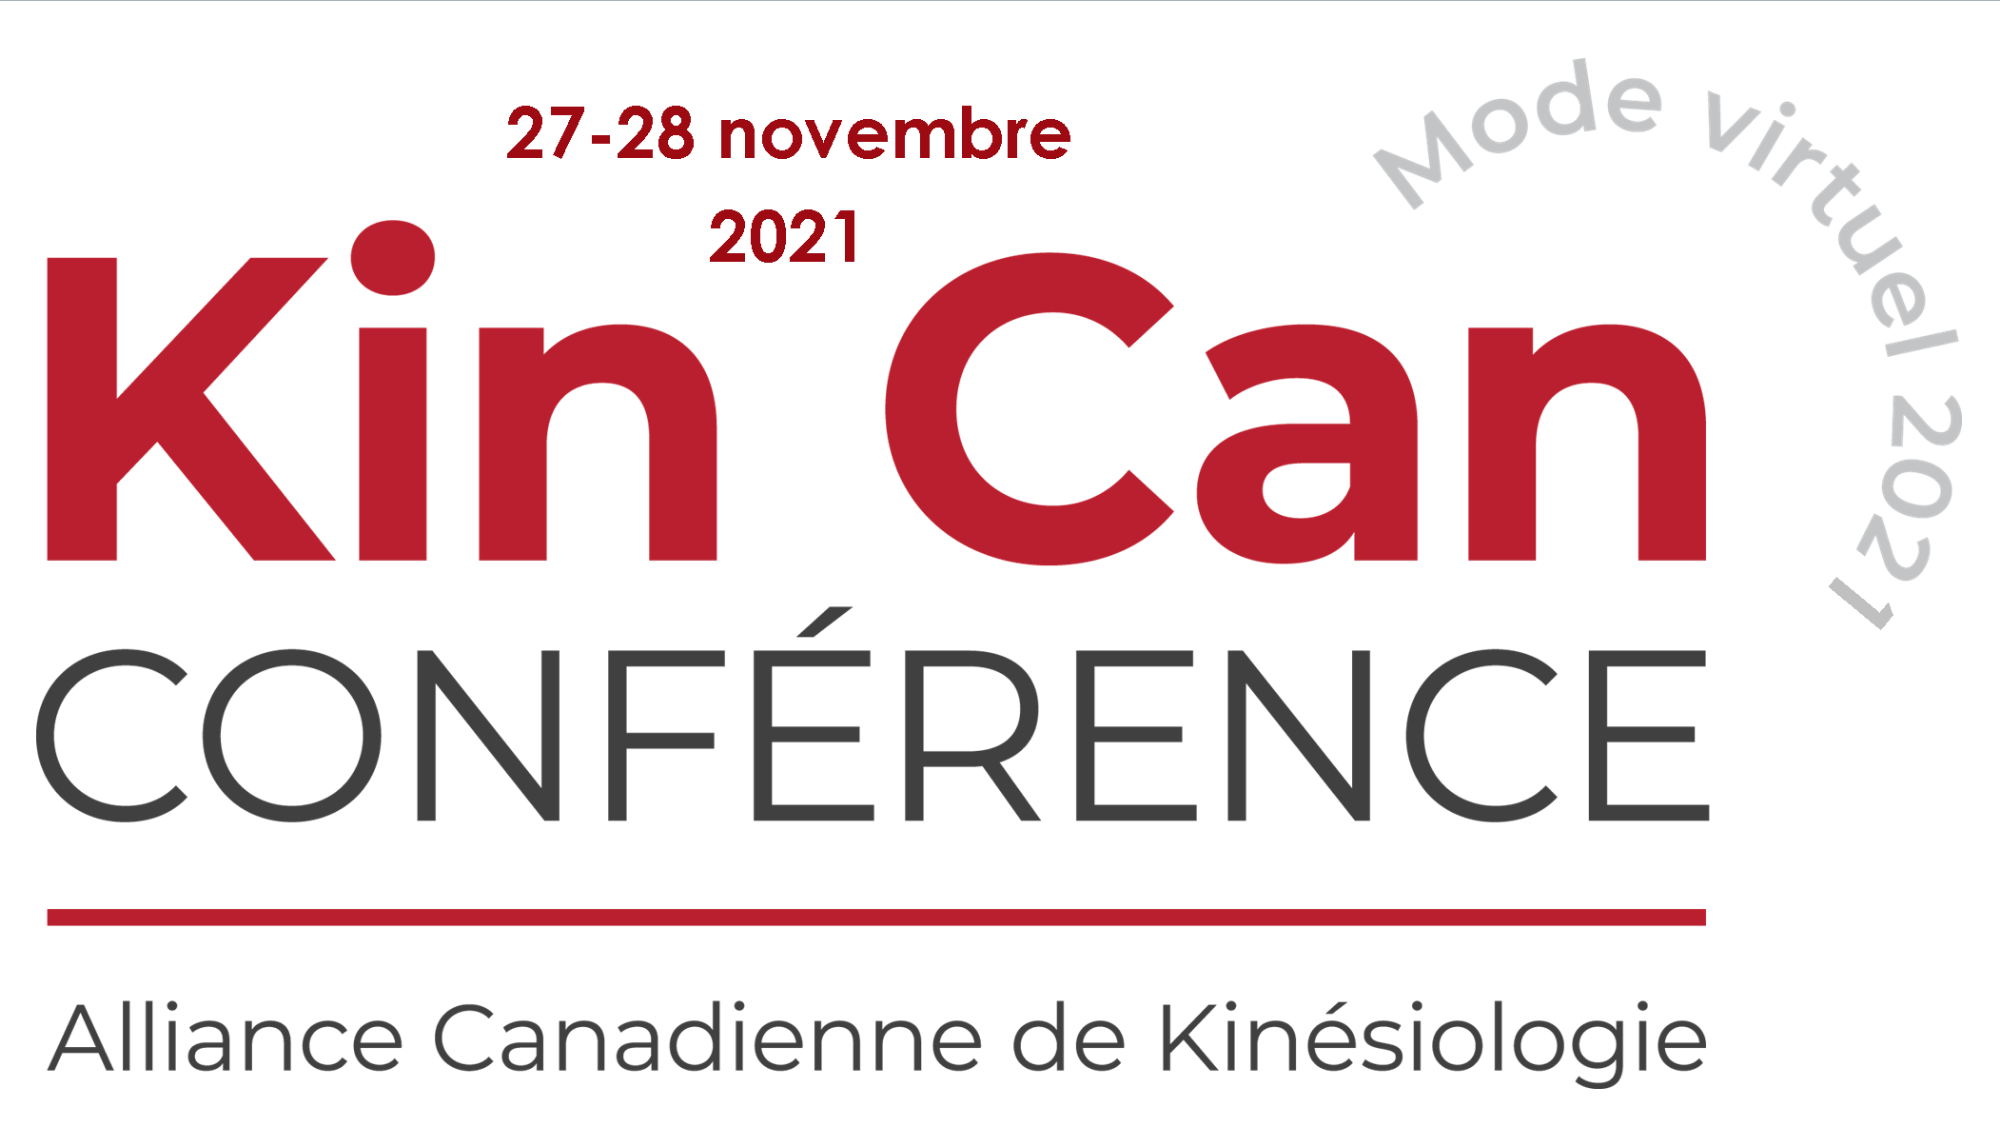 Conférence national de kinésiologie 2021